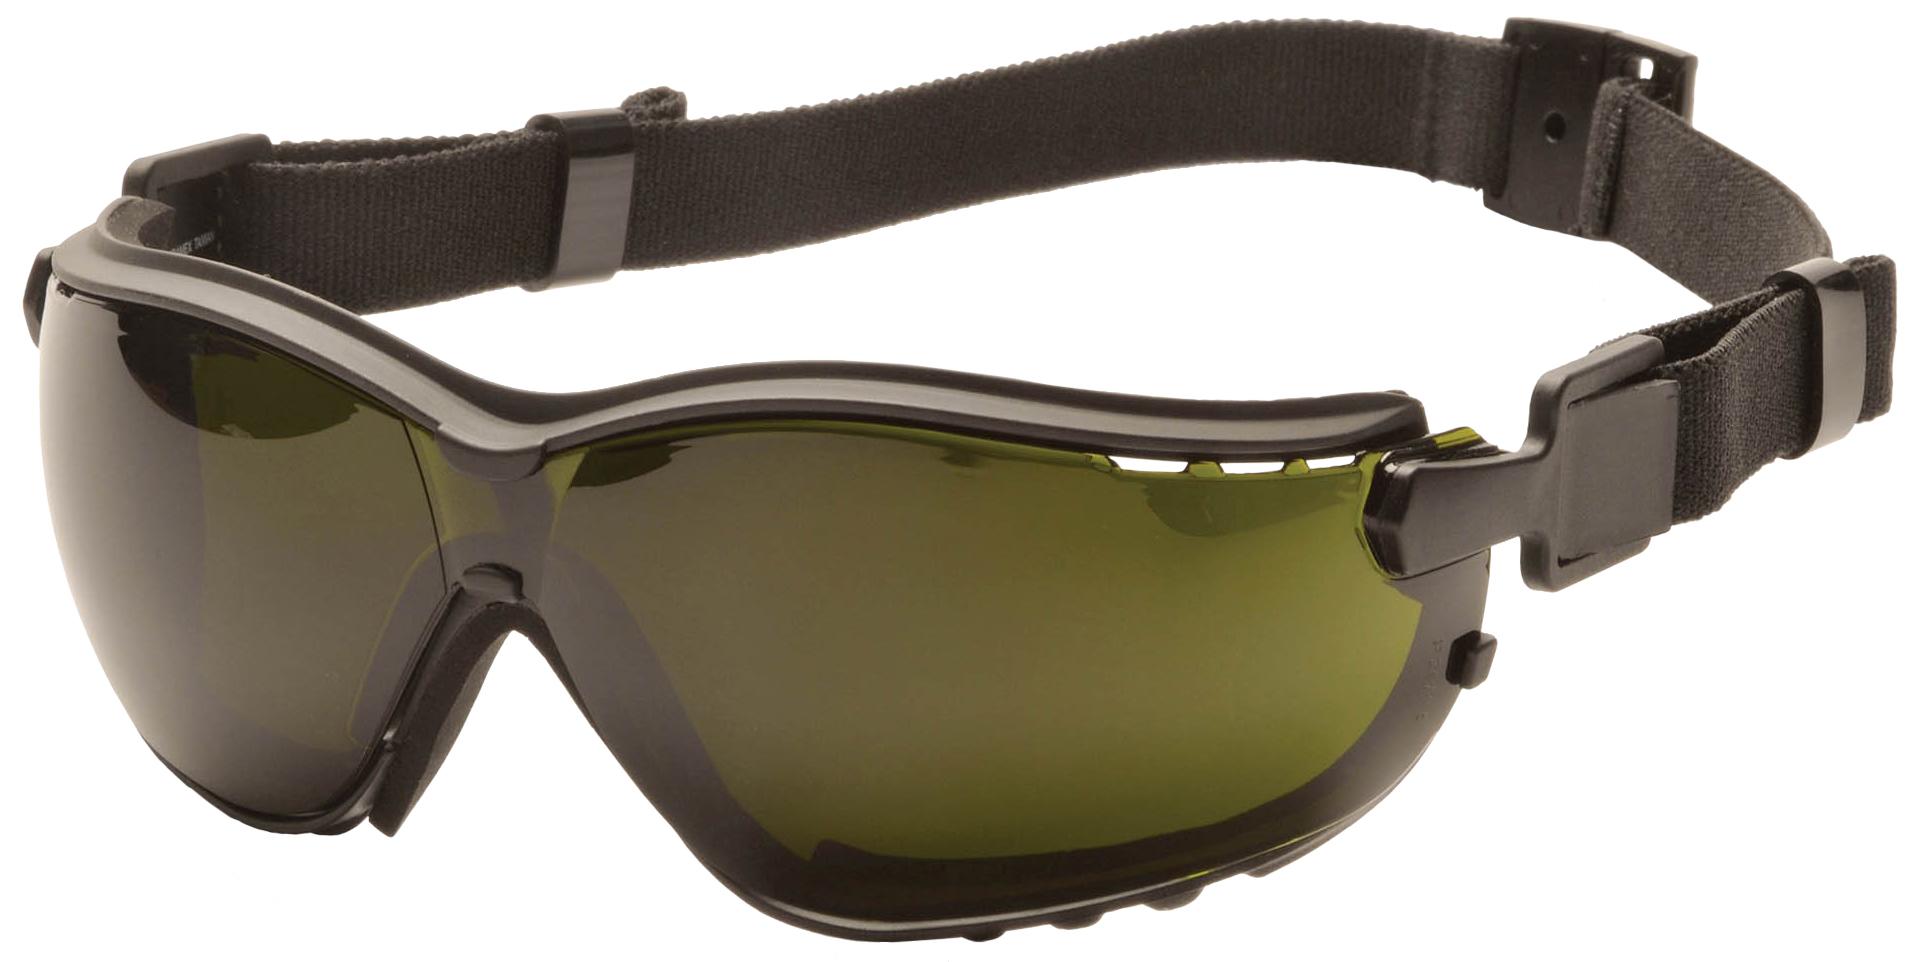 5.0 Welding Goggle W/ Anti Fog Lens